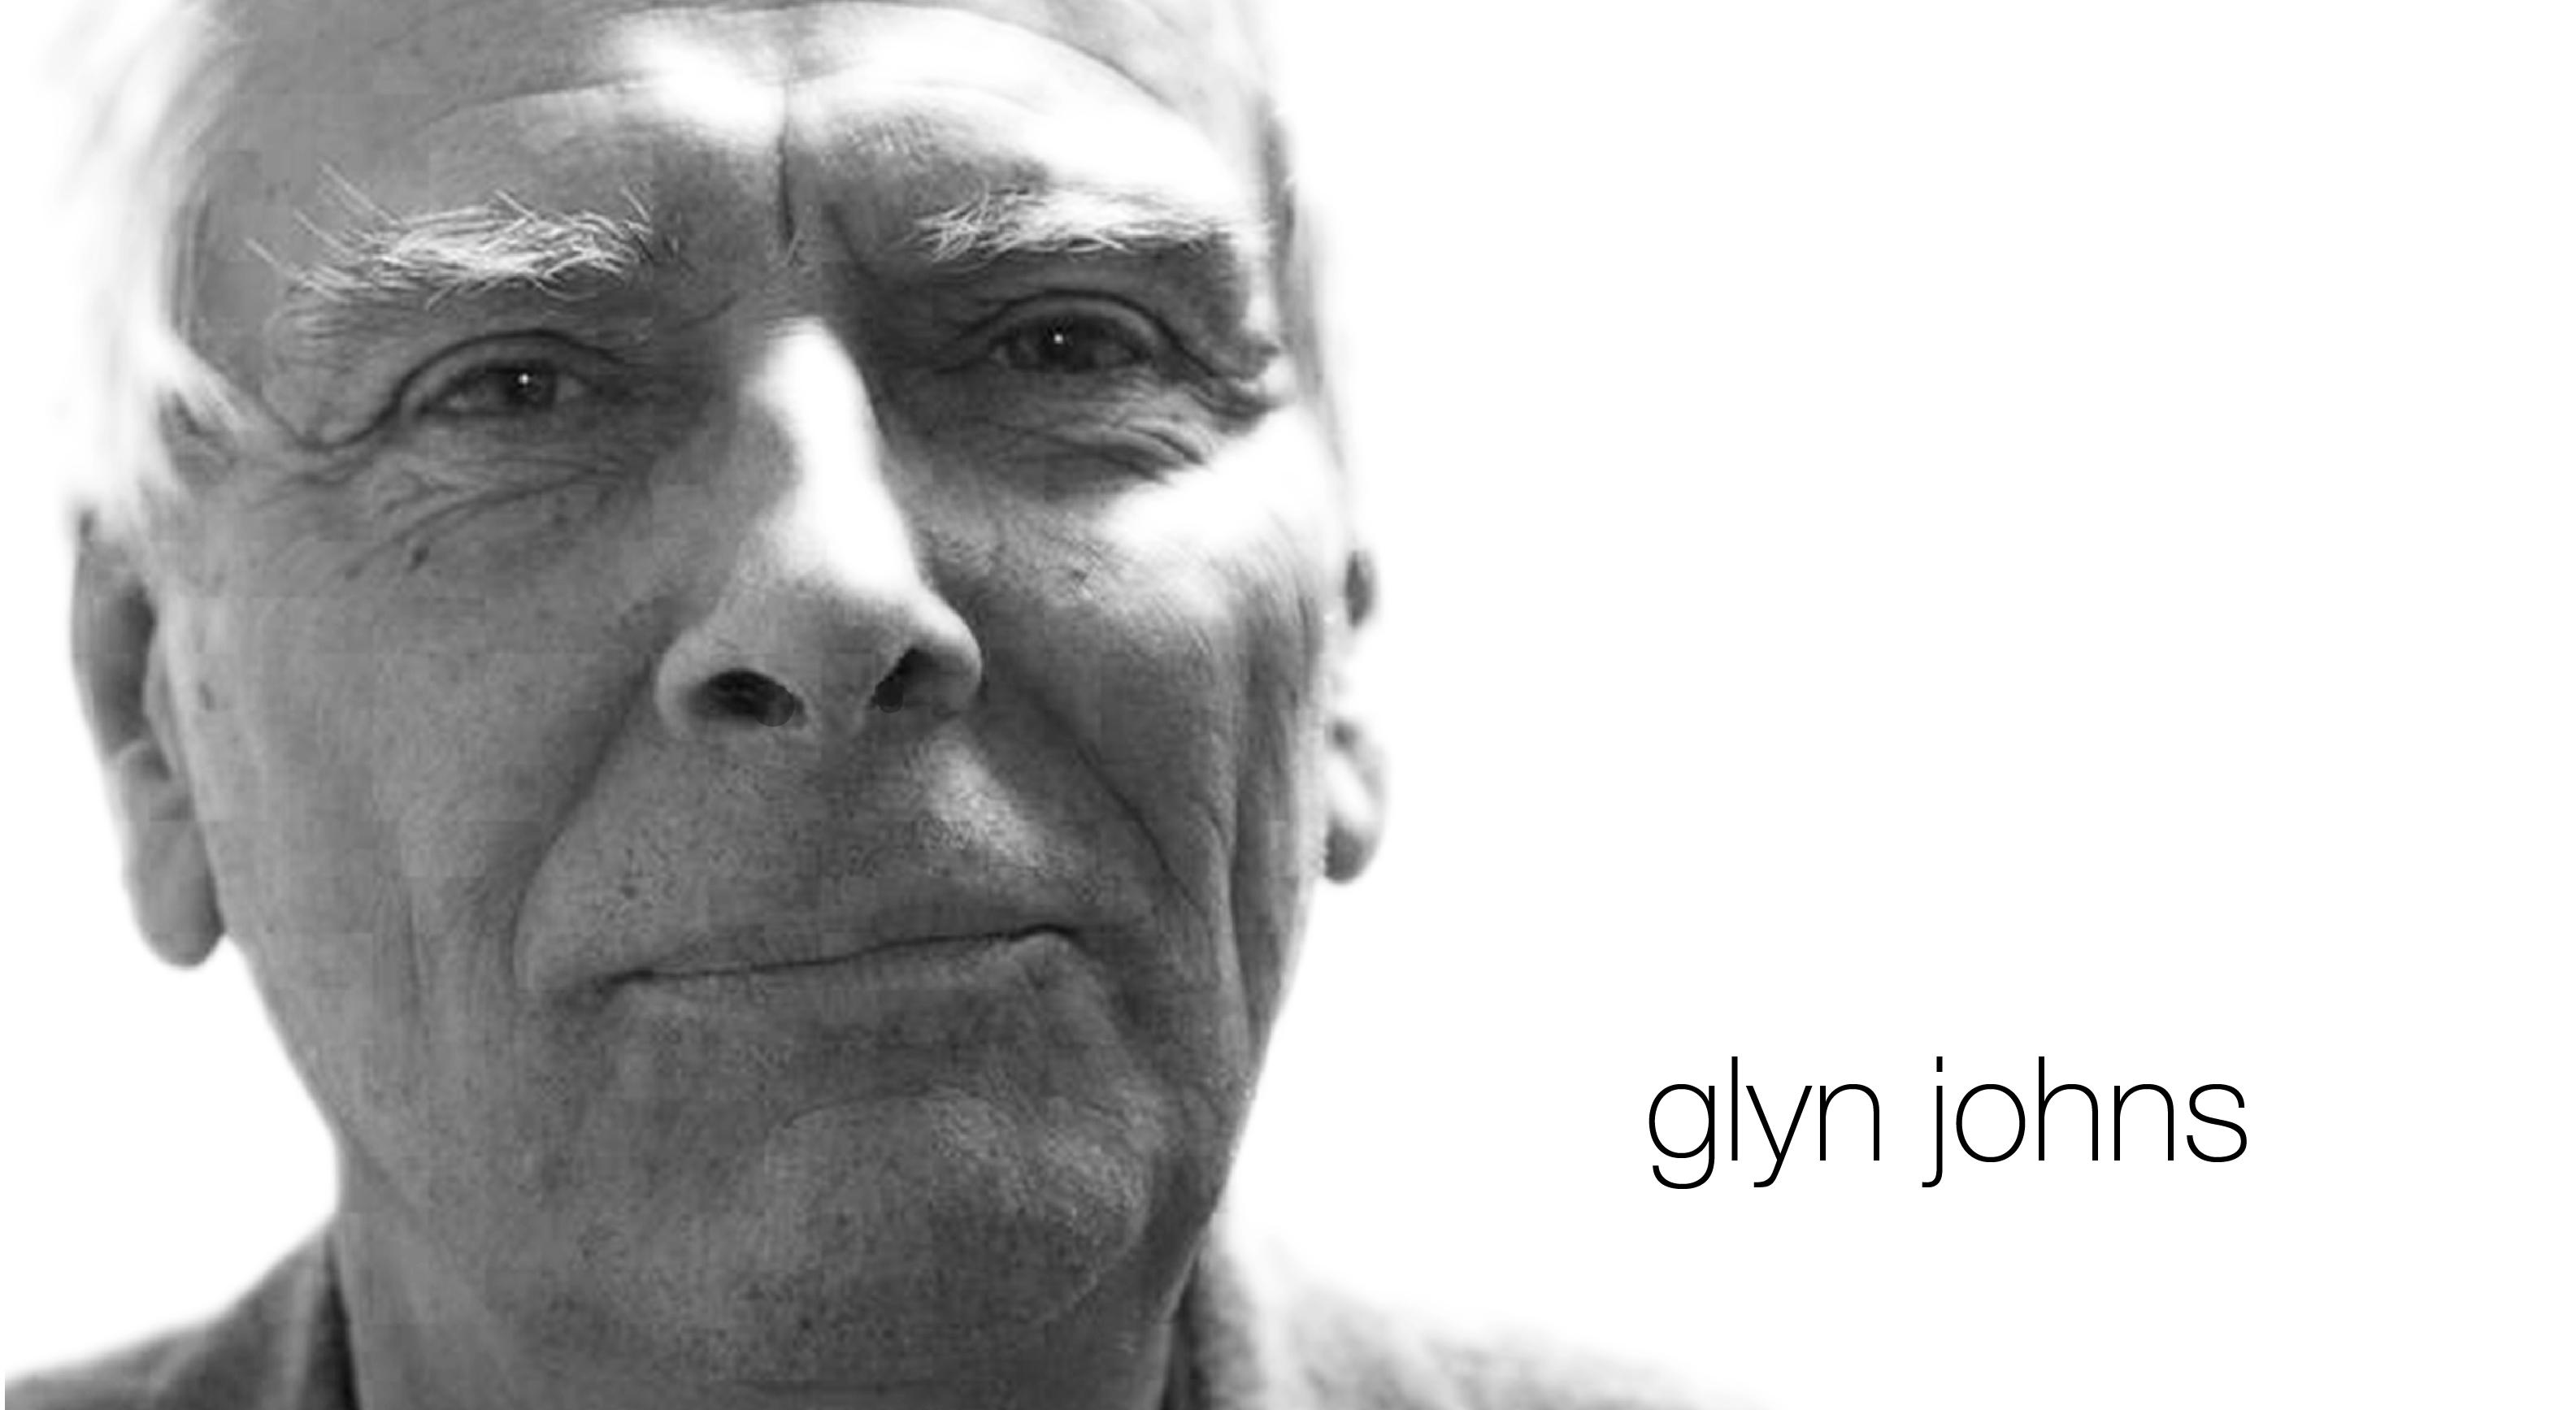 glynjohnsslide-01